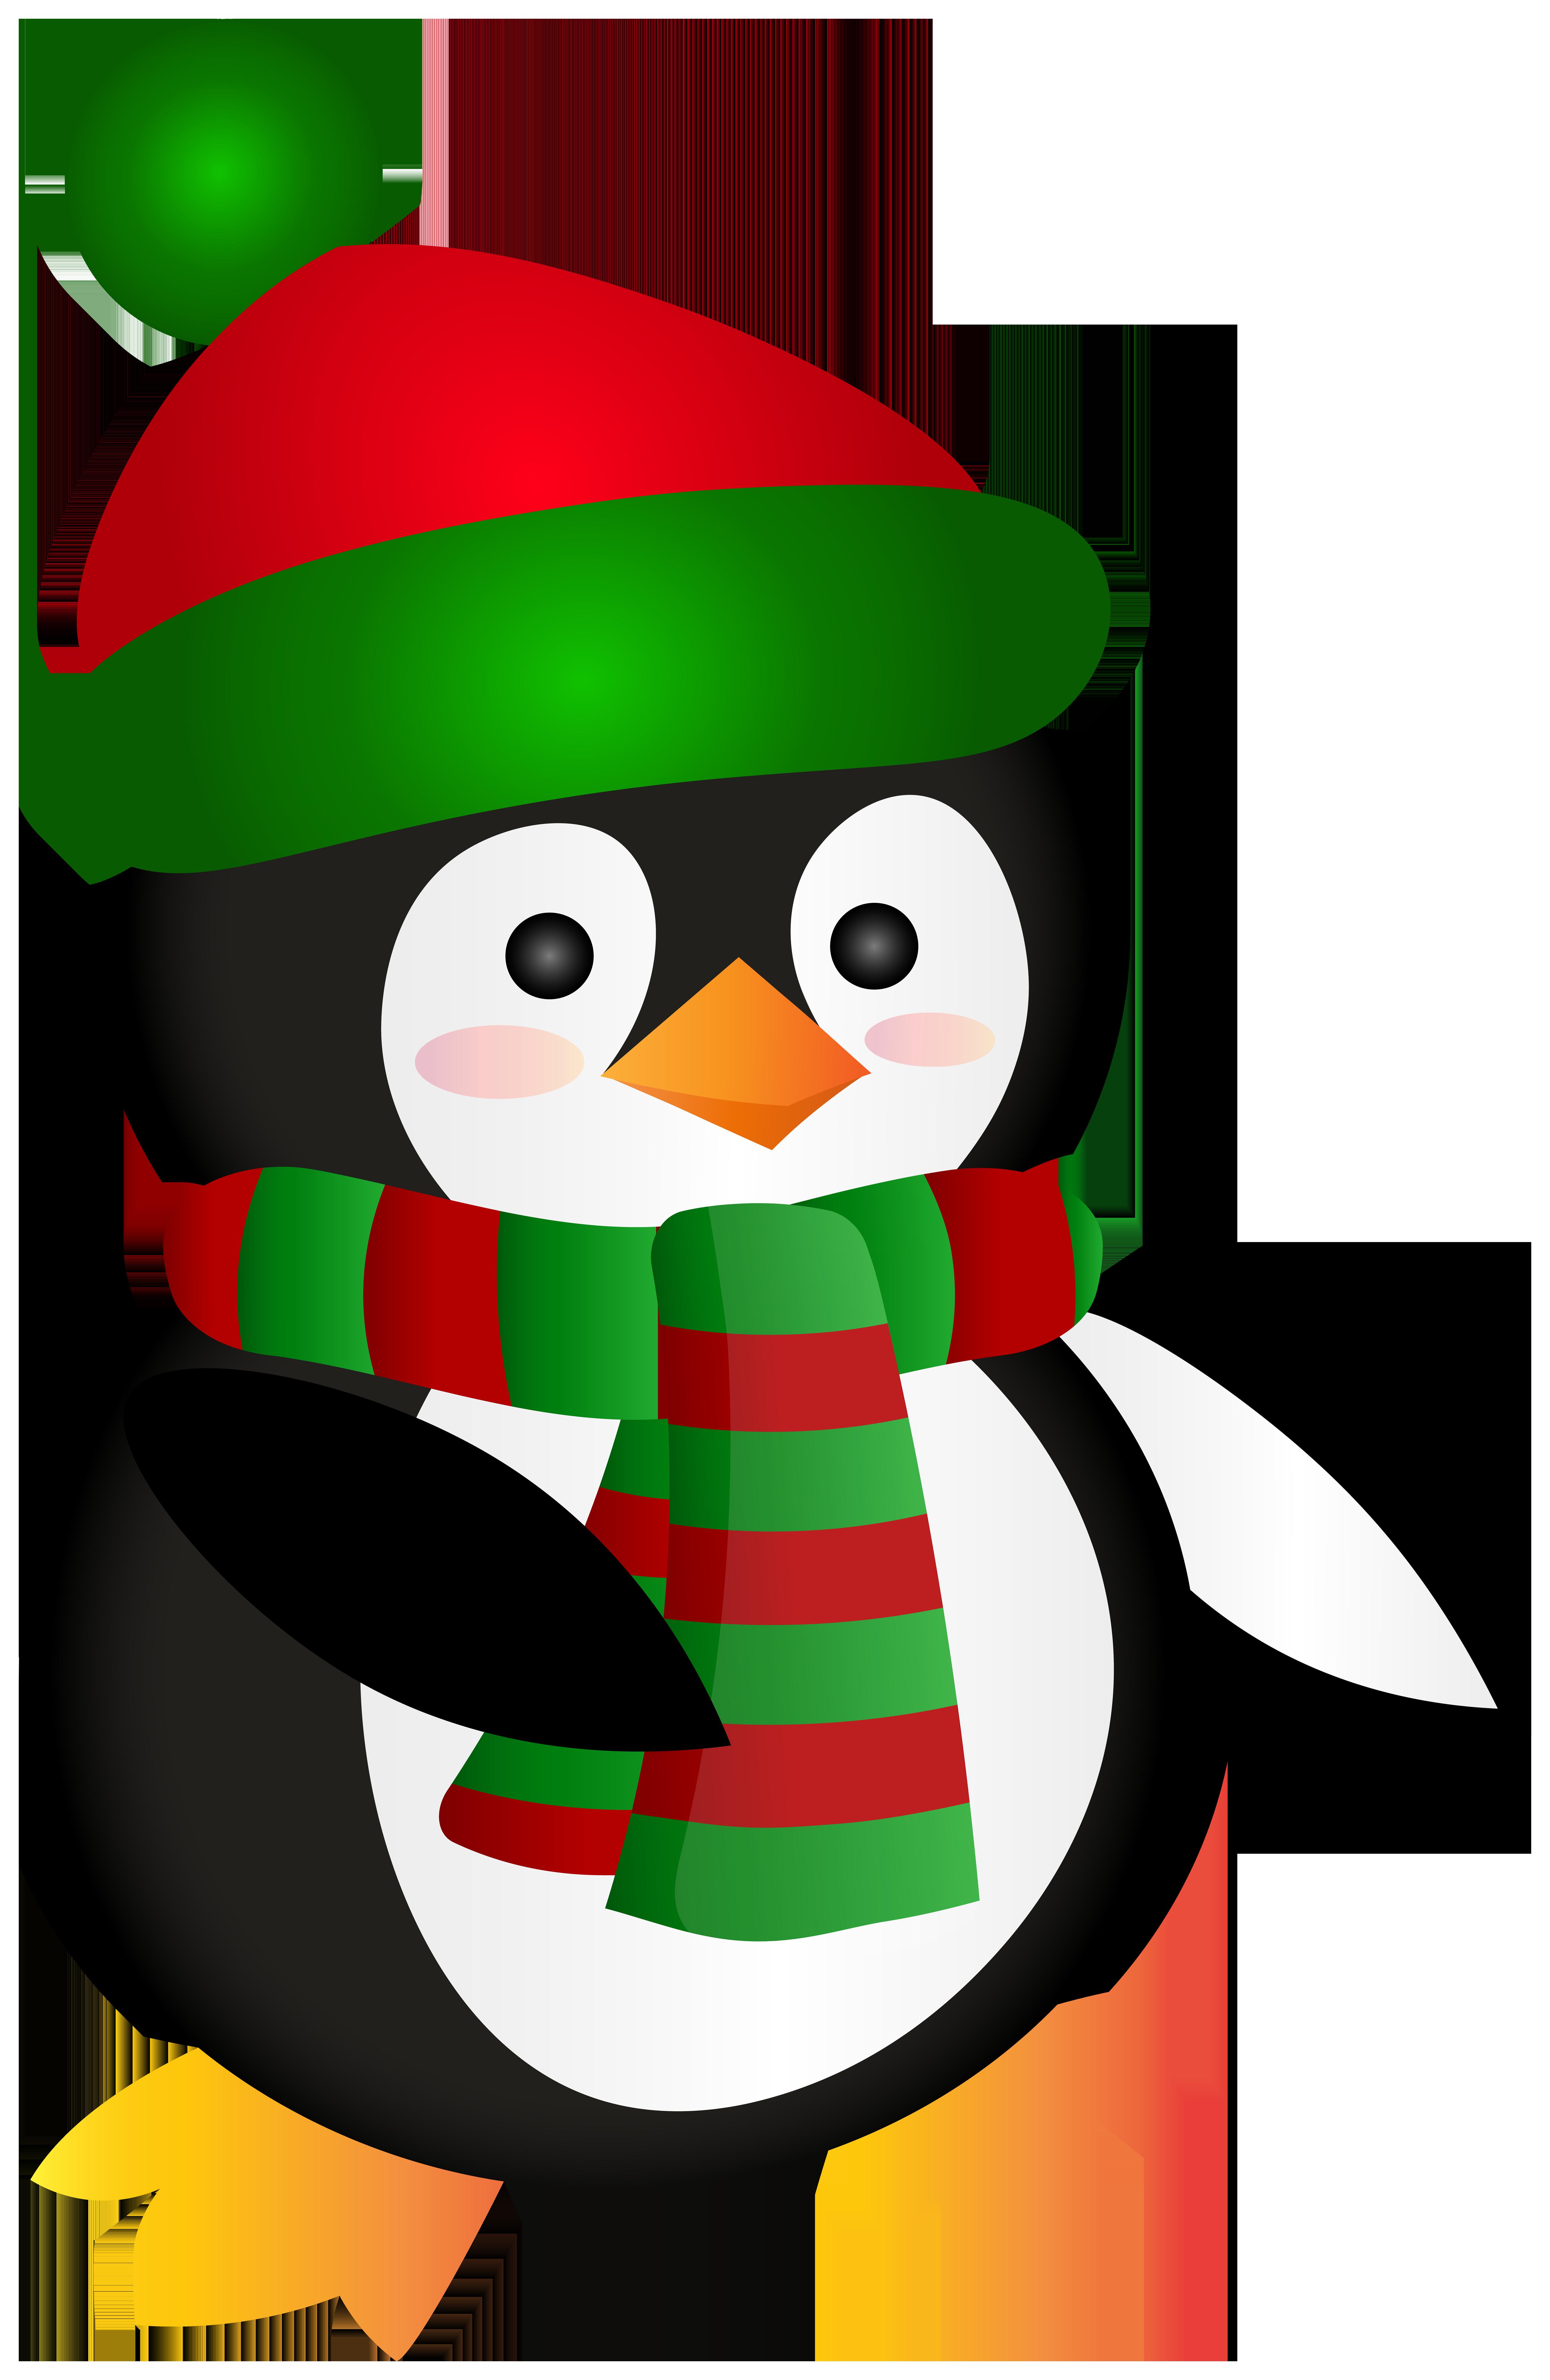 Cute Christmas Penguin Clip Art Image.